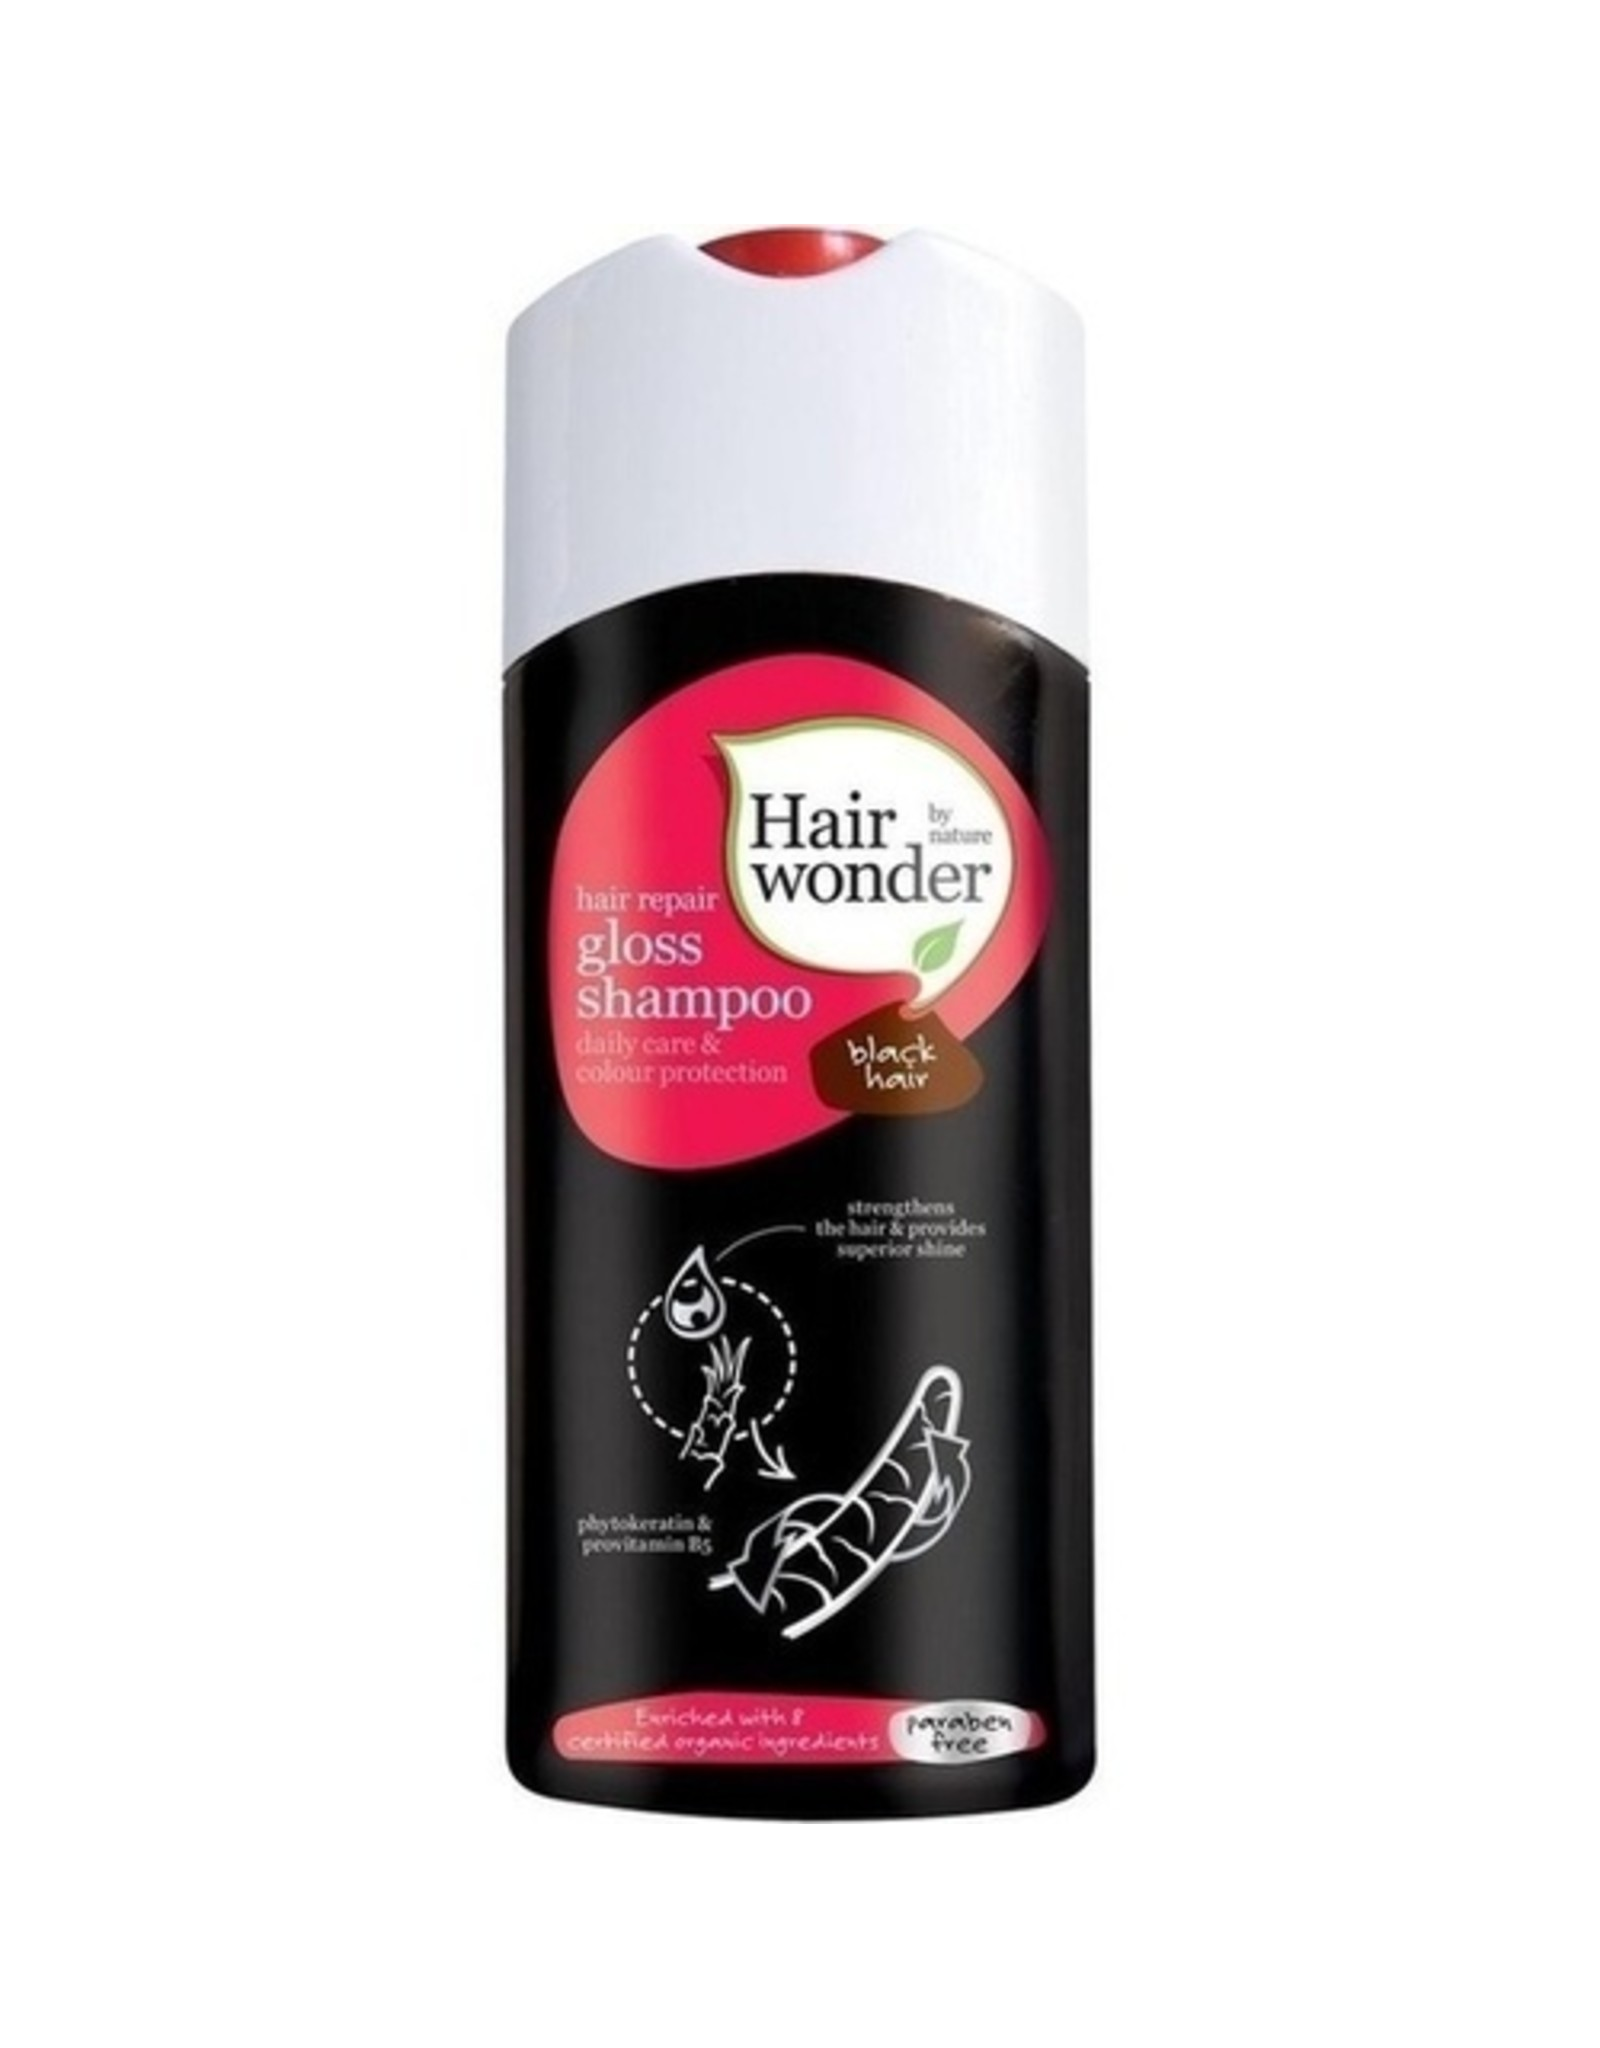 Hairwonder Gloss Shampoo Black Hair 200ml